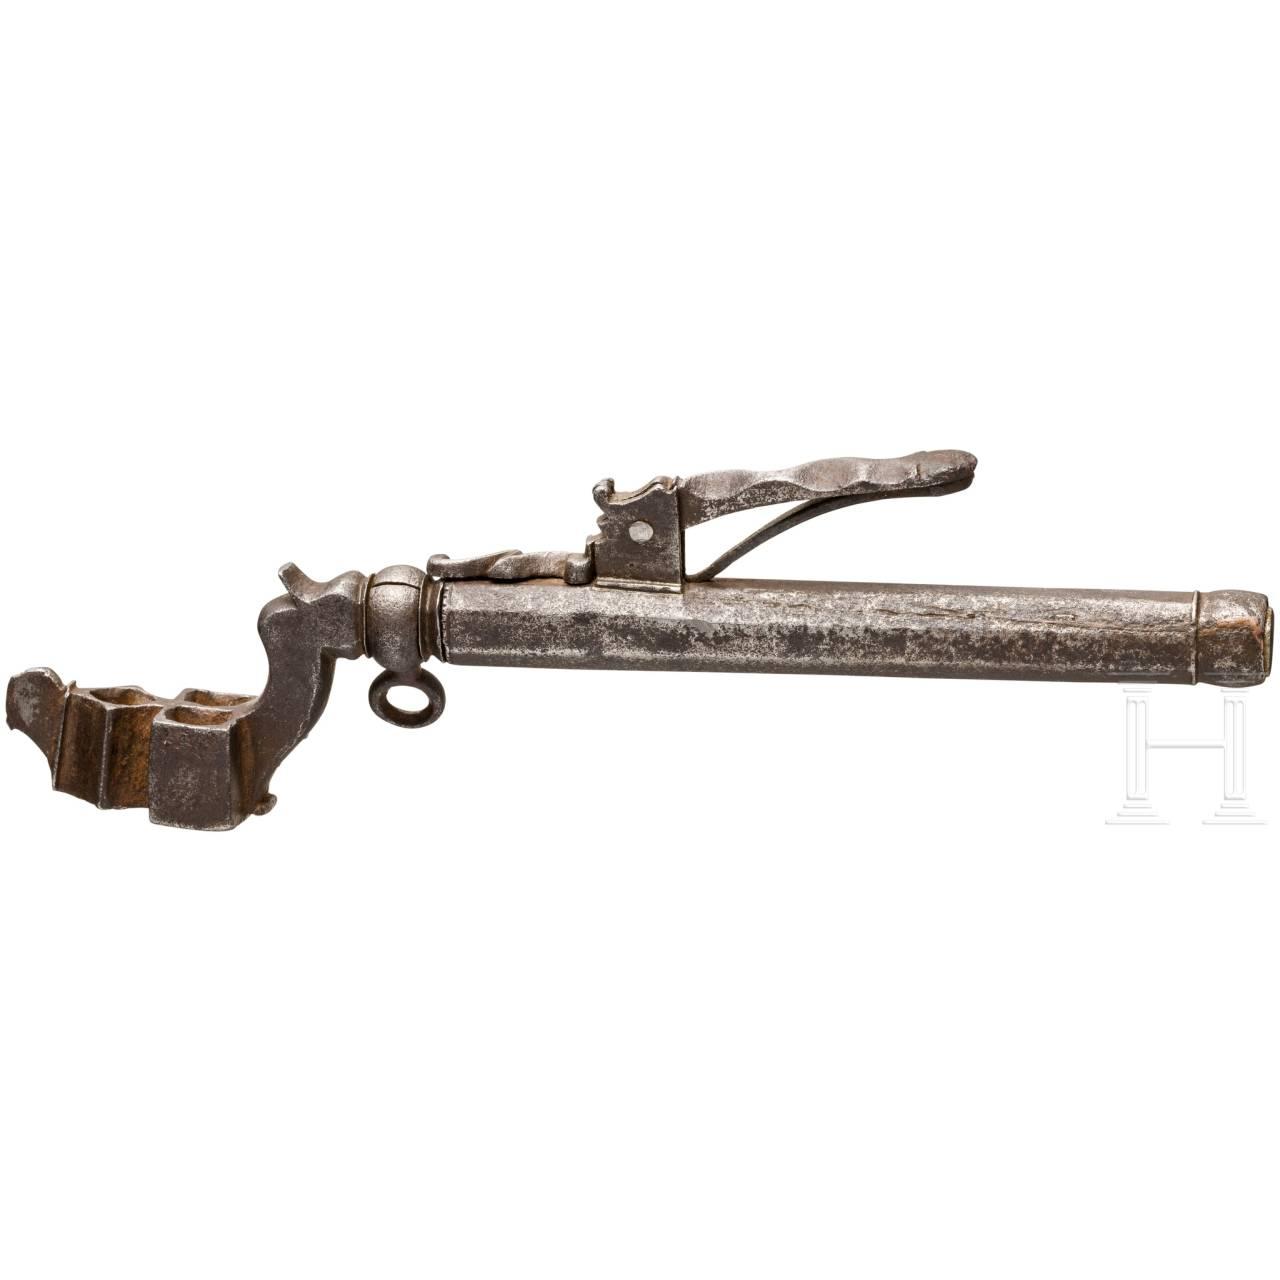 A German wheel lock key with powder measure, around 1600